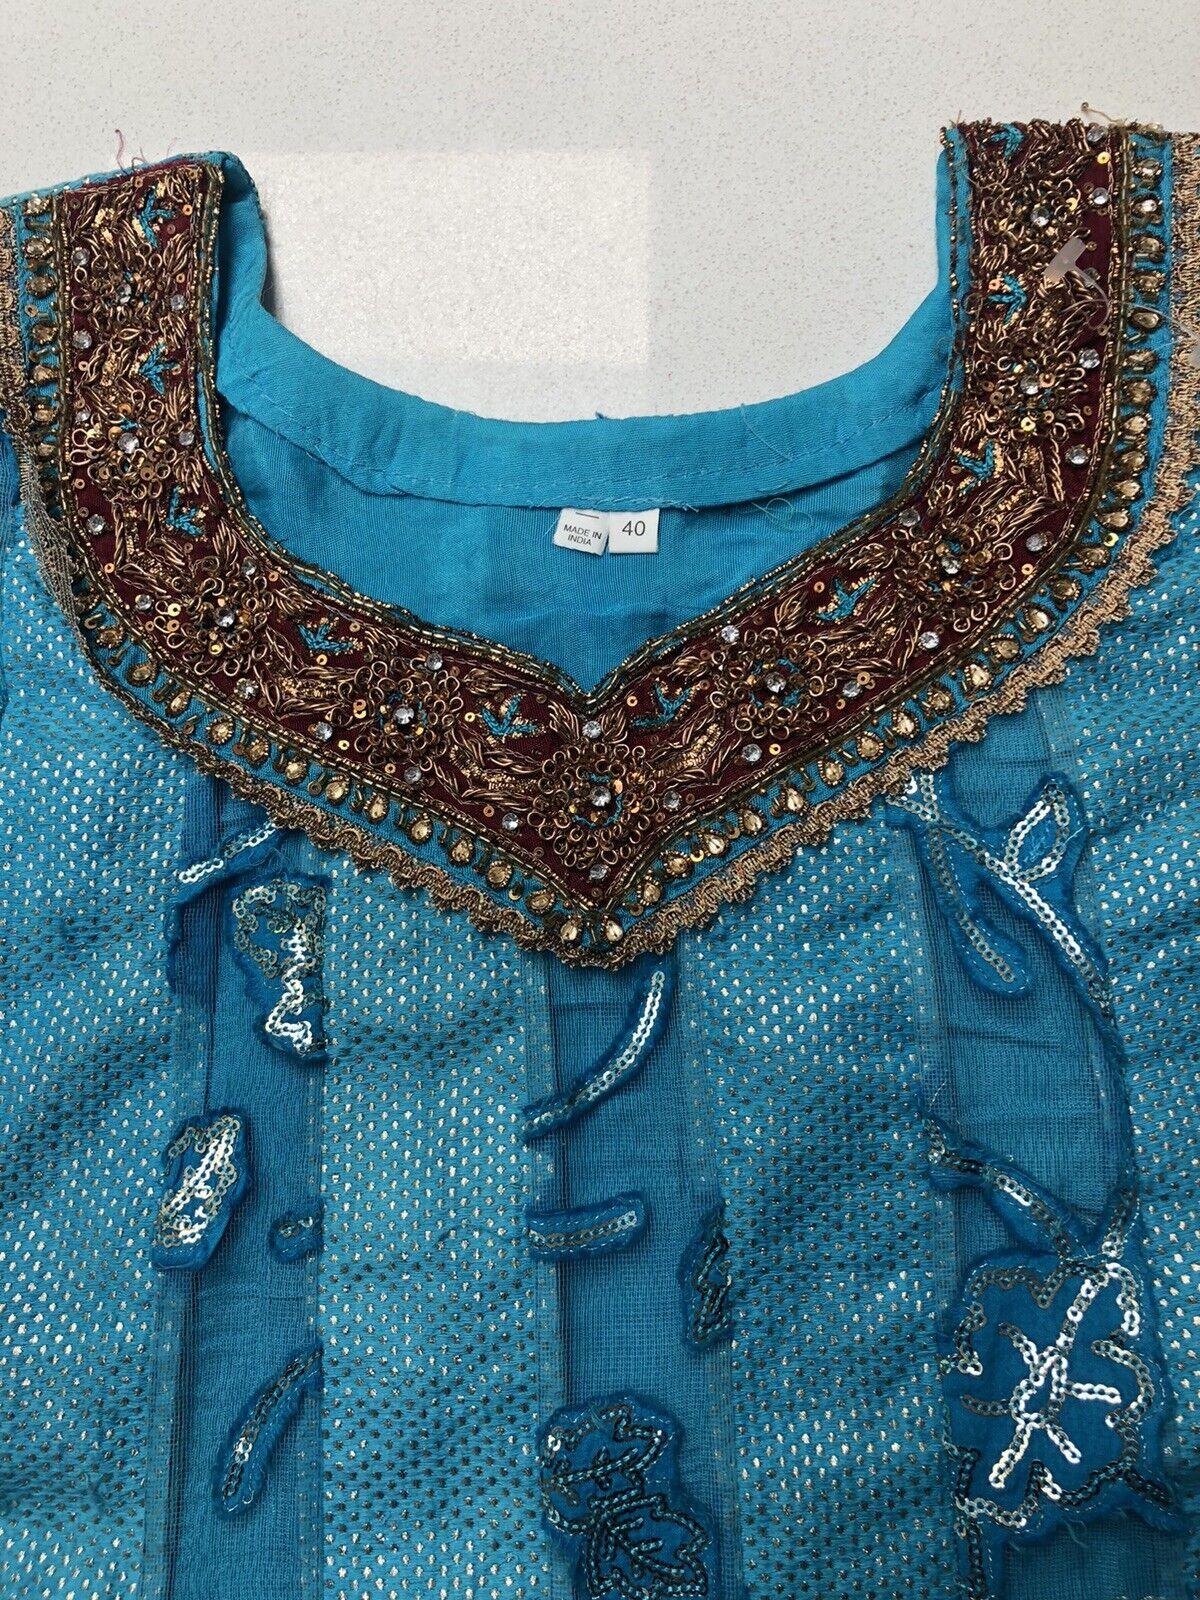 New Women's Girls Asian Embellished Indian Wedding Shirt Dress Kameez Size 8 40